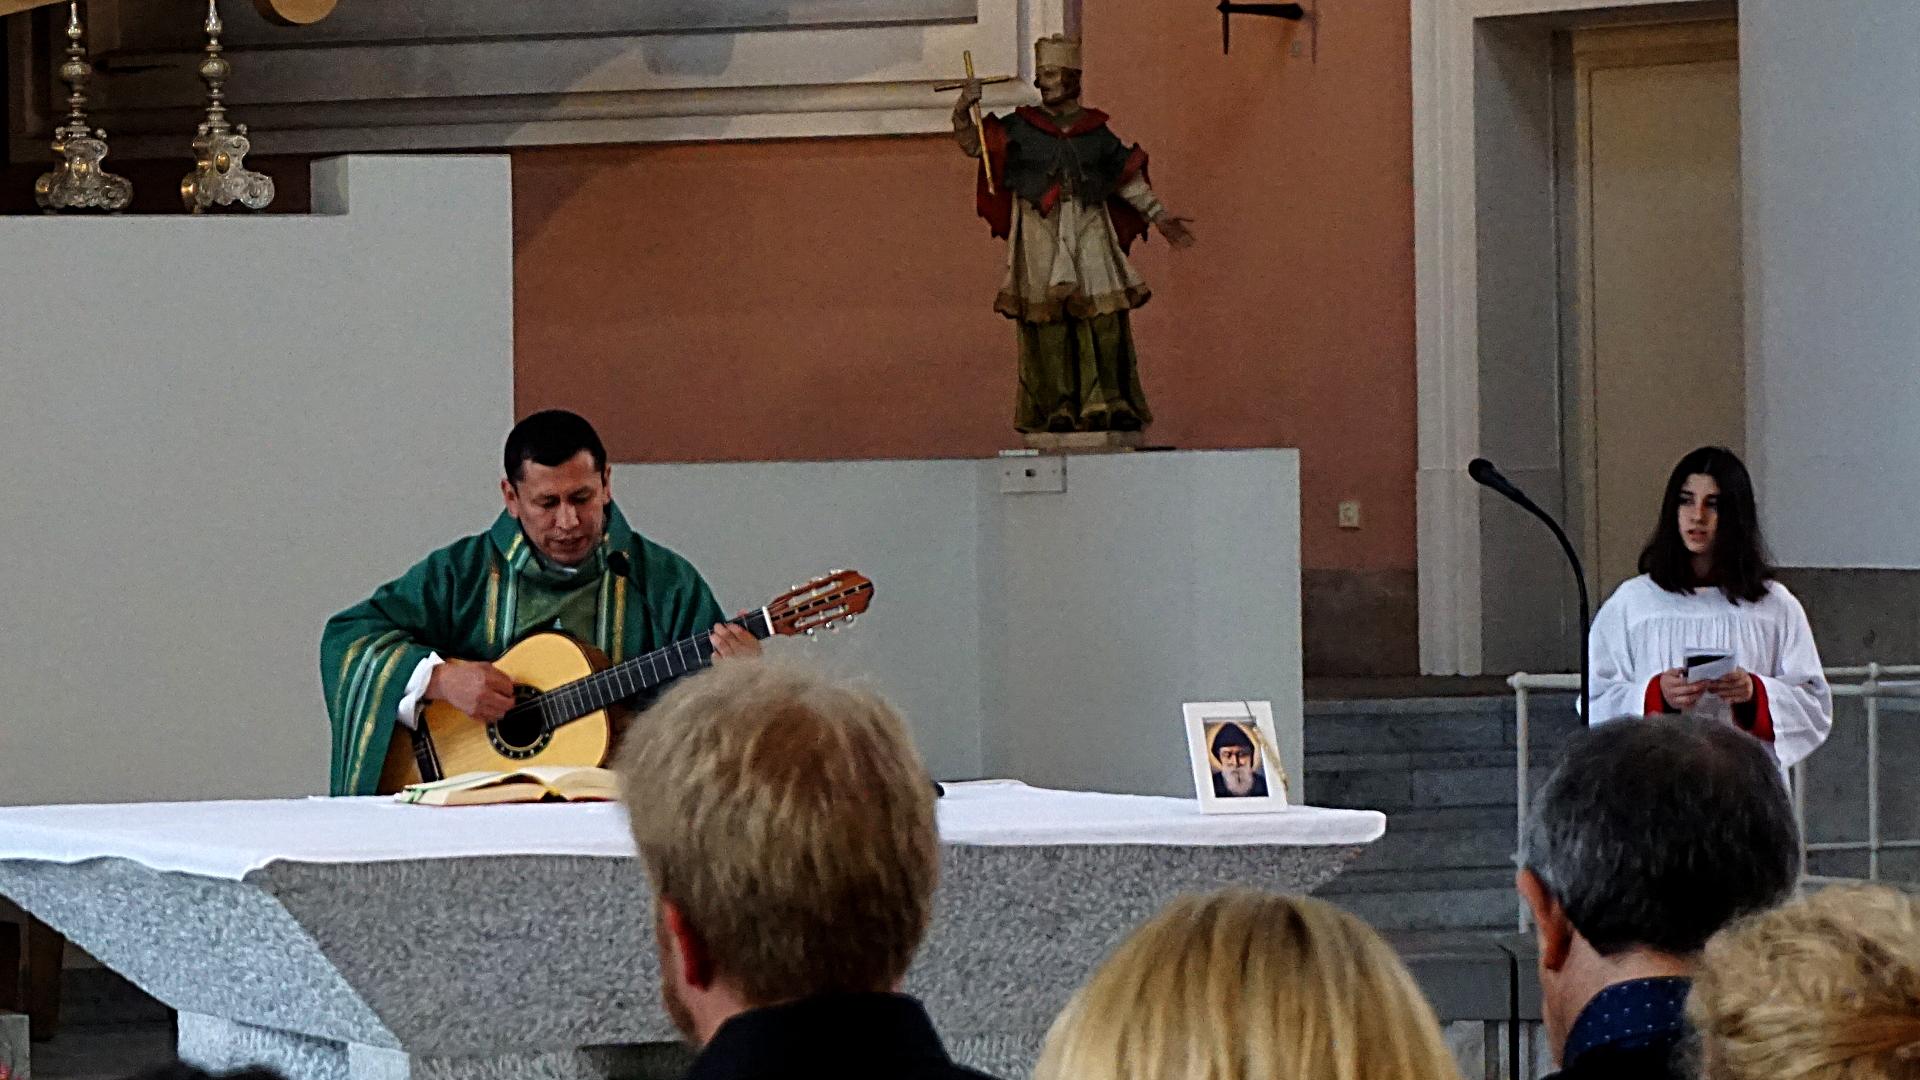 Messe der spanischen Mission in St. Clemens, Hannover — Experiment